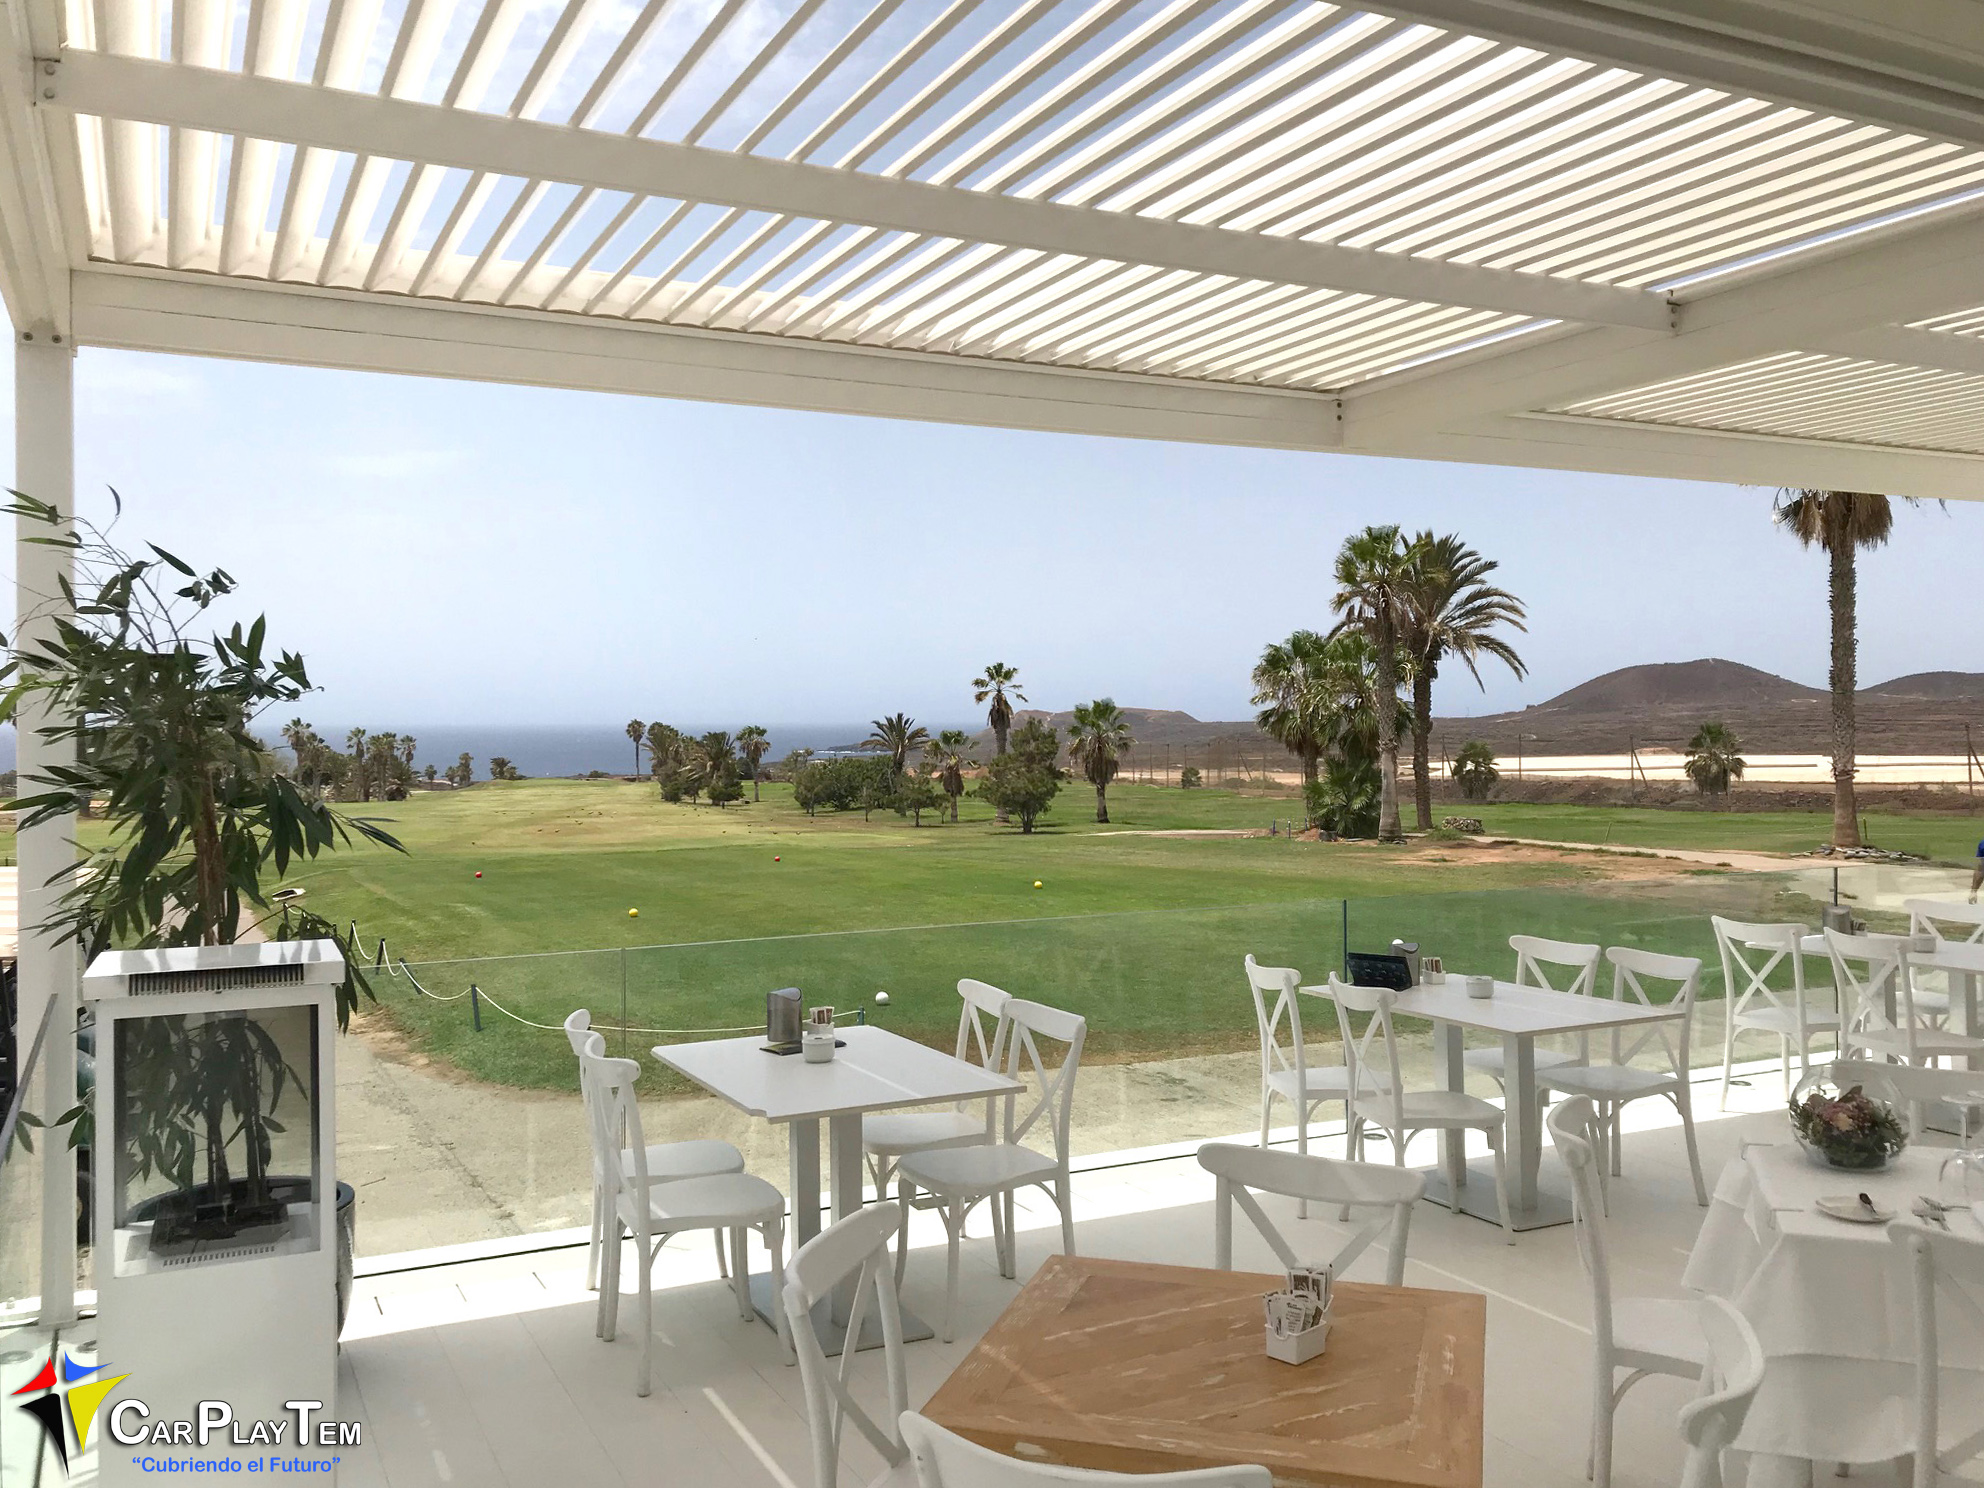 Pérgola Bioclimatica. Amarilla Golf. Tenerife